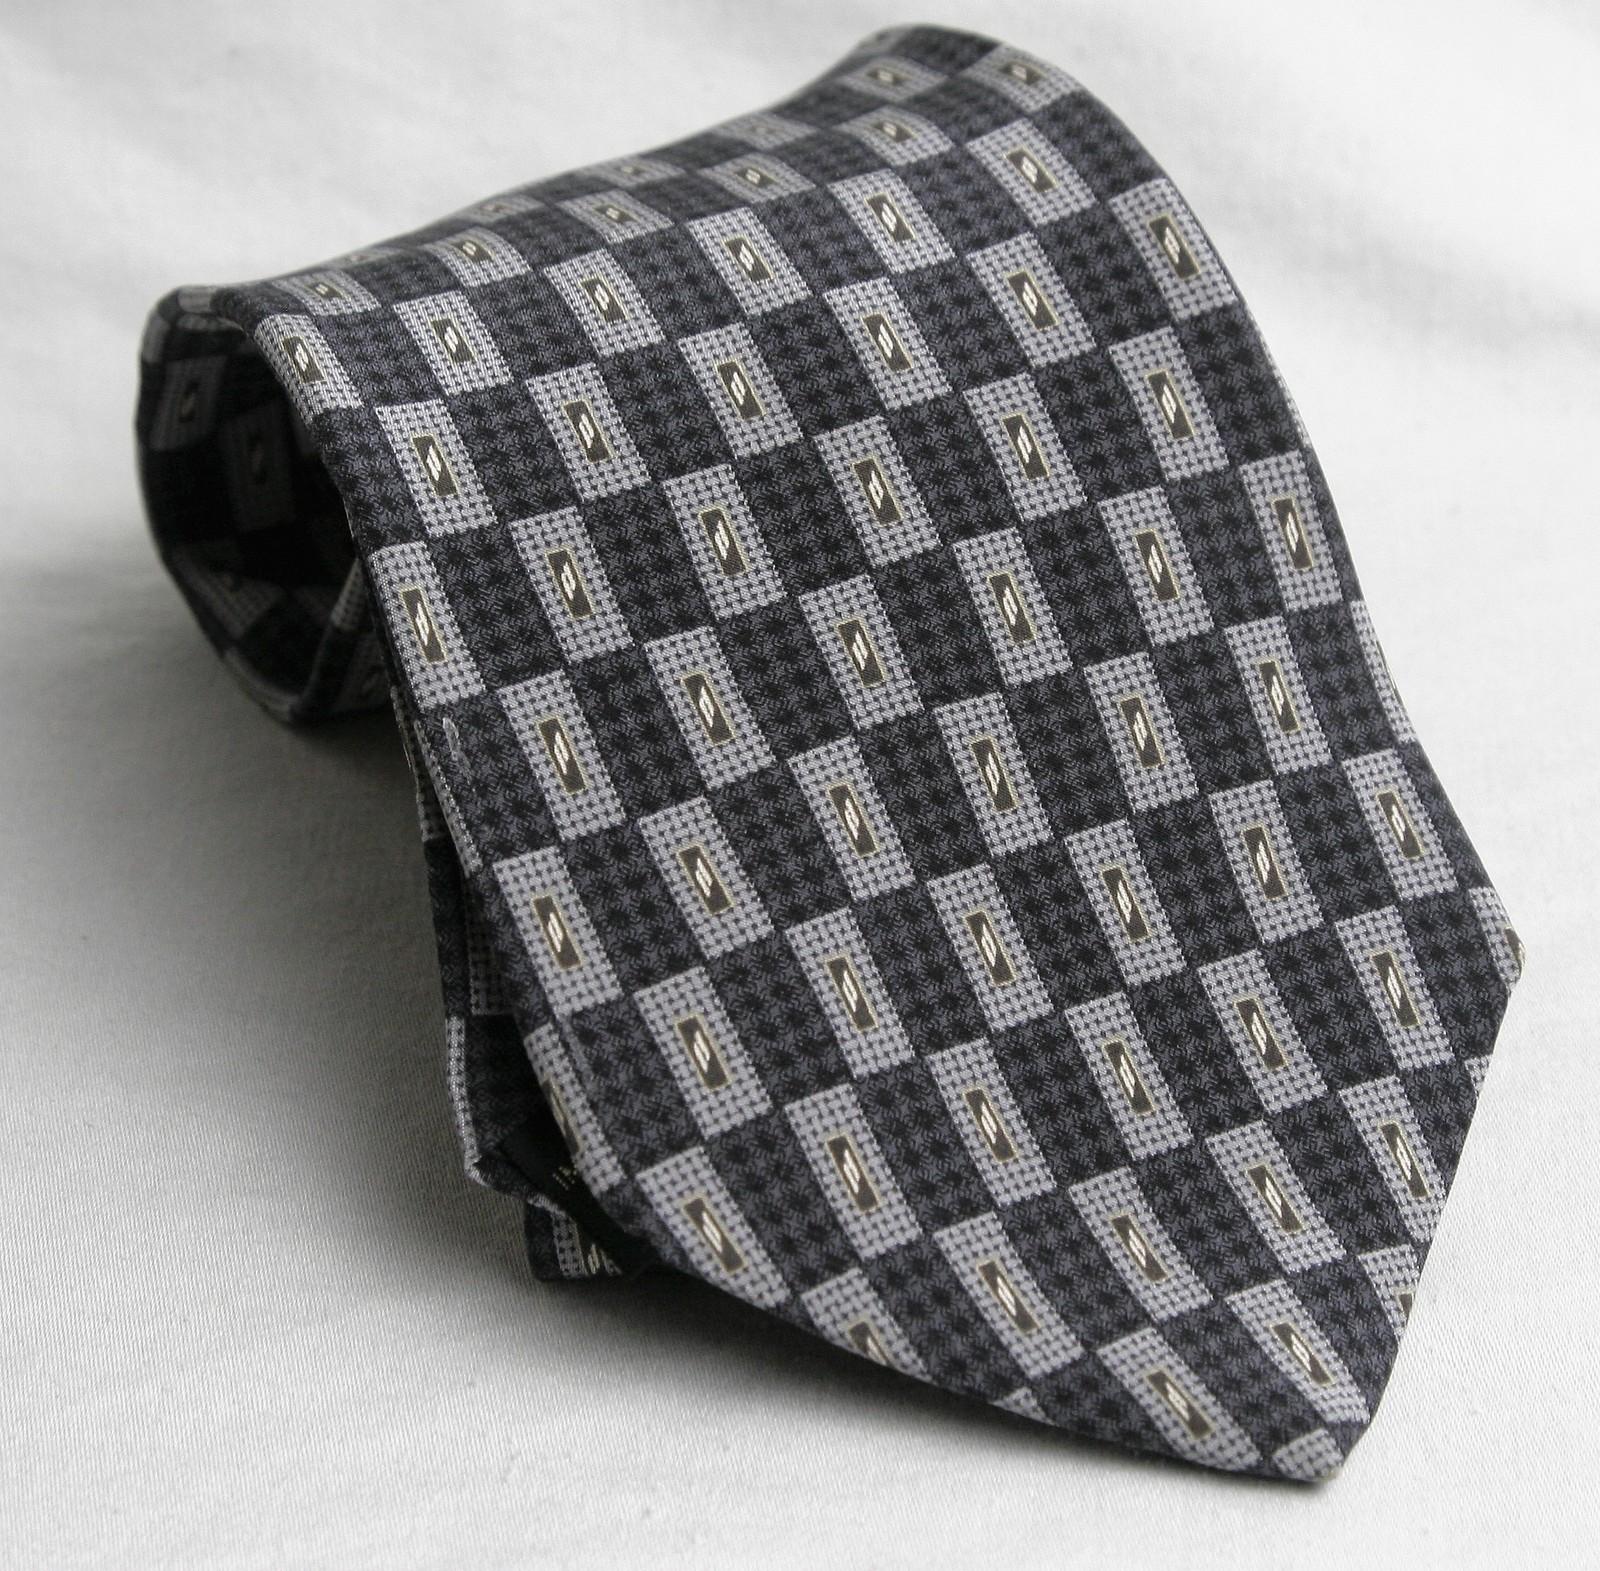 Kenneth Cole  Tie Necktie Geometeric Gray, White, Black Gold